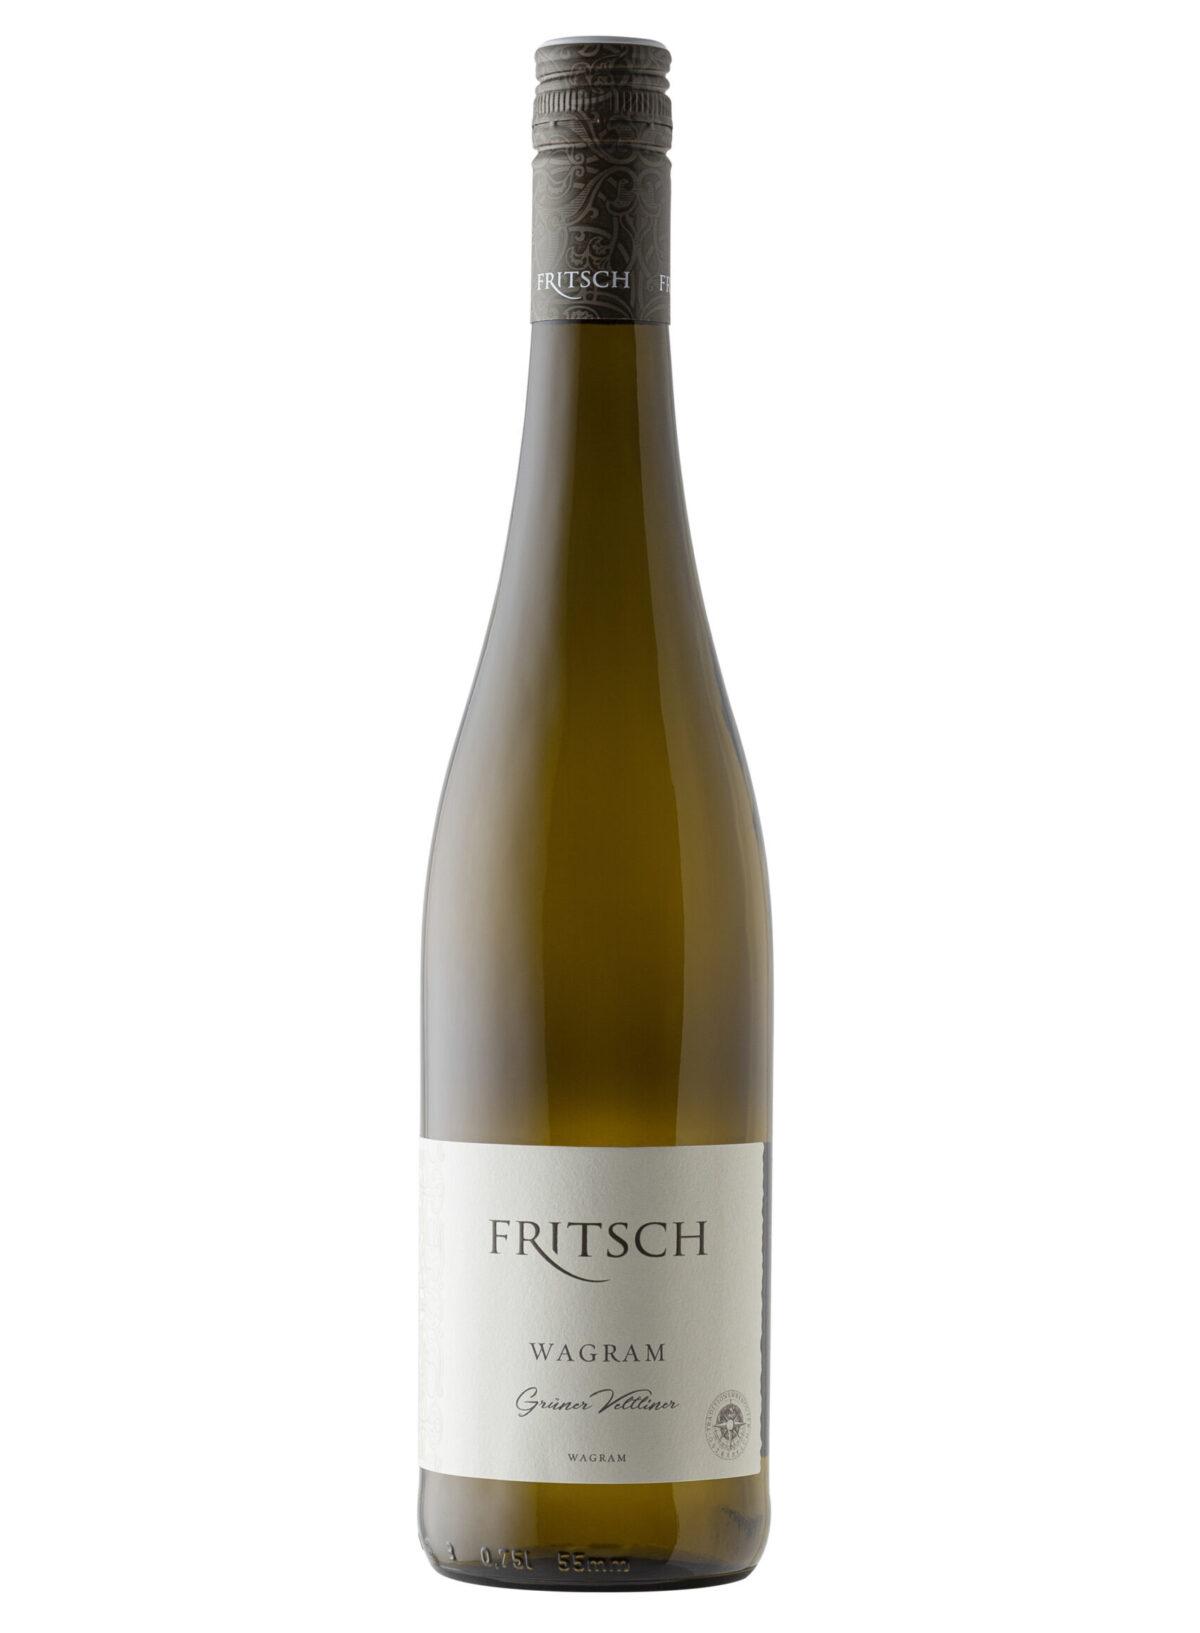 Fritsch Gruner Veltliner Wine bottle..